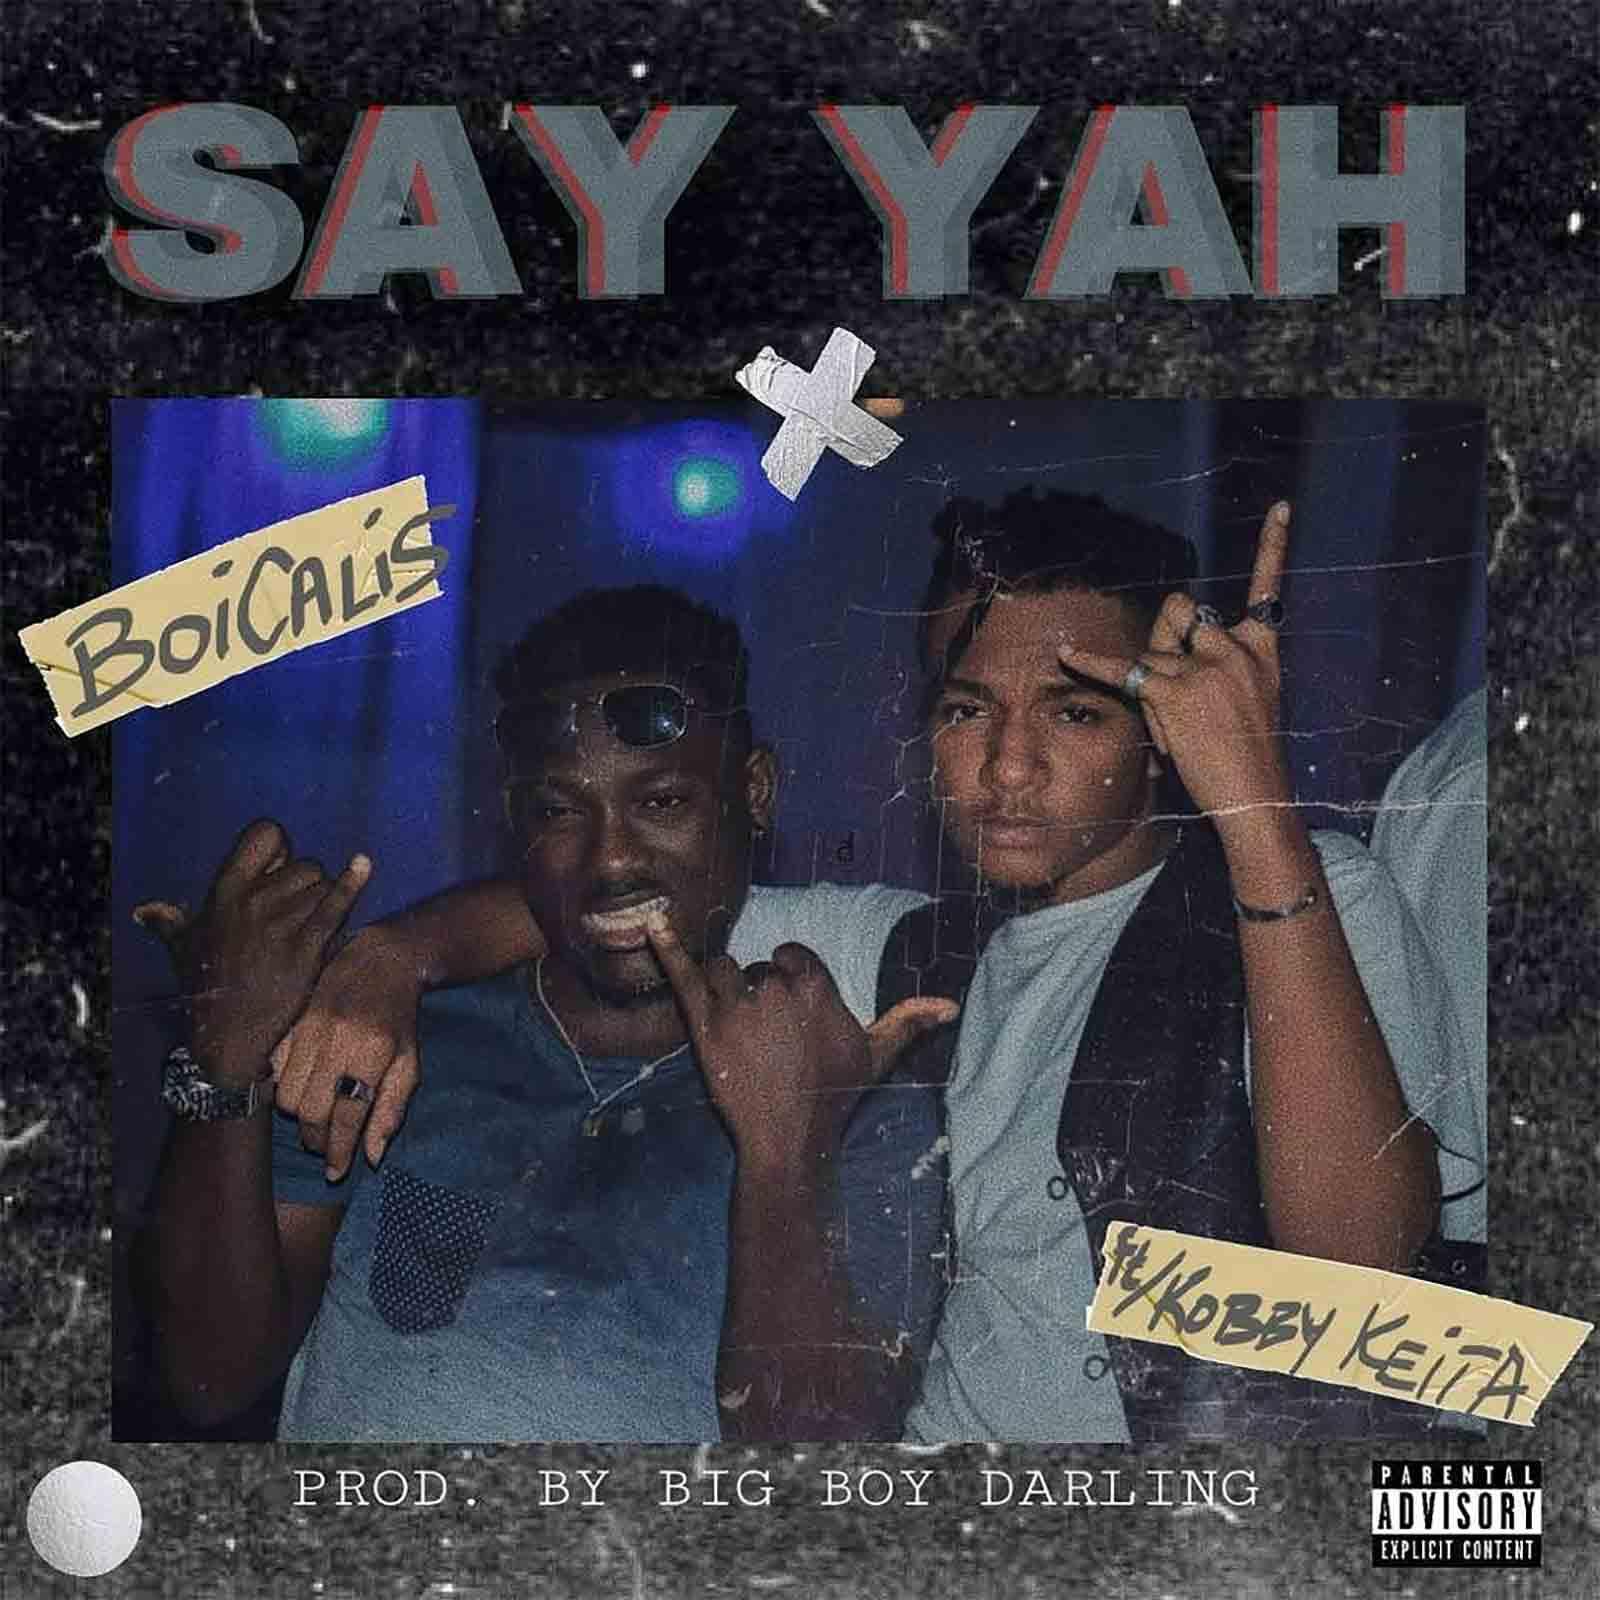 Say Yah feat. Kobby Keita by Boicalis